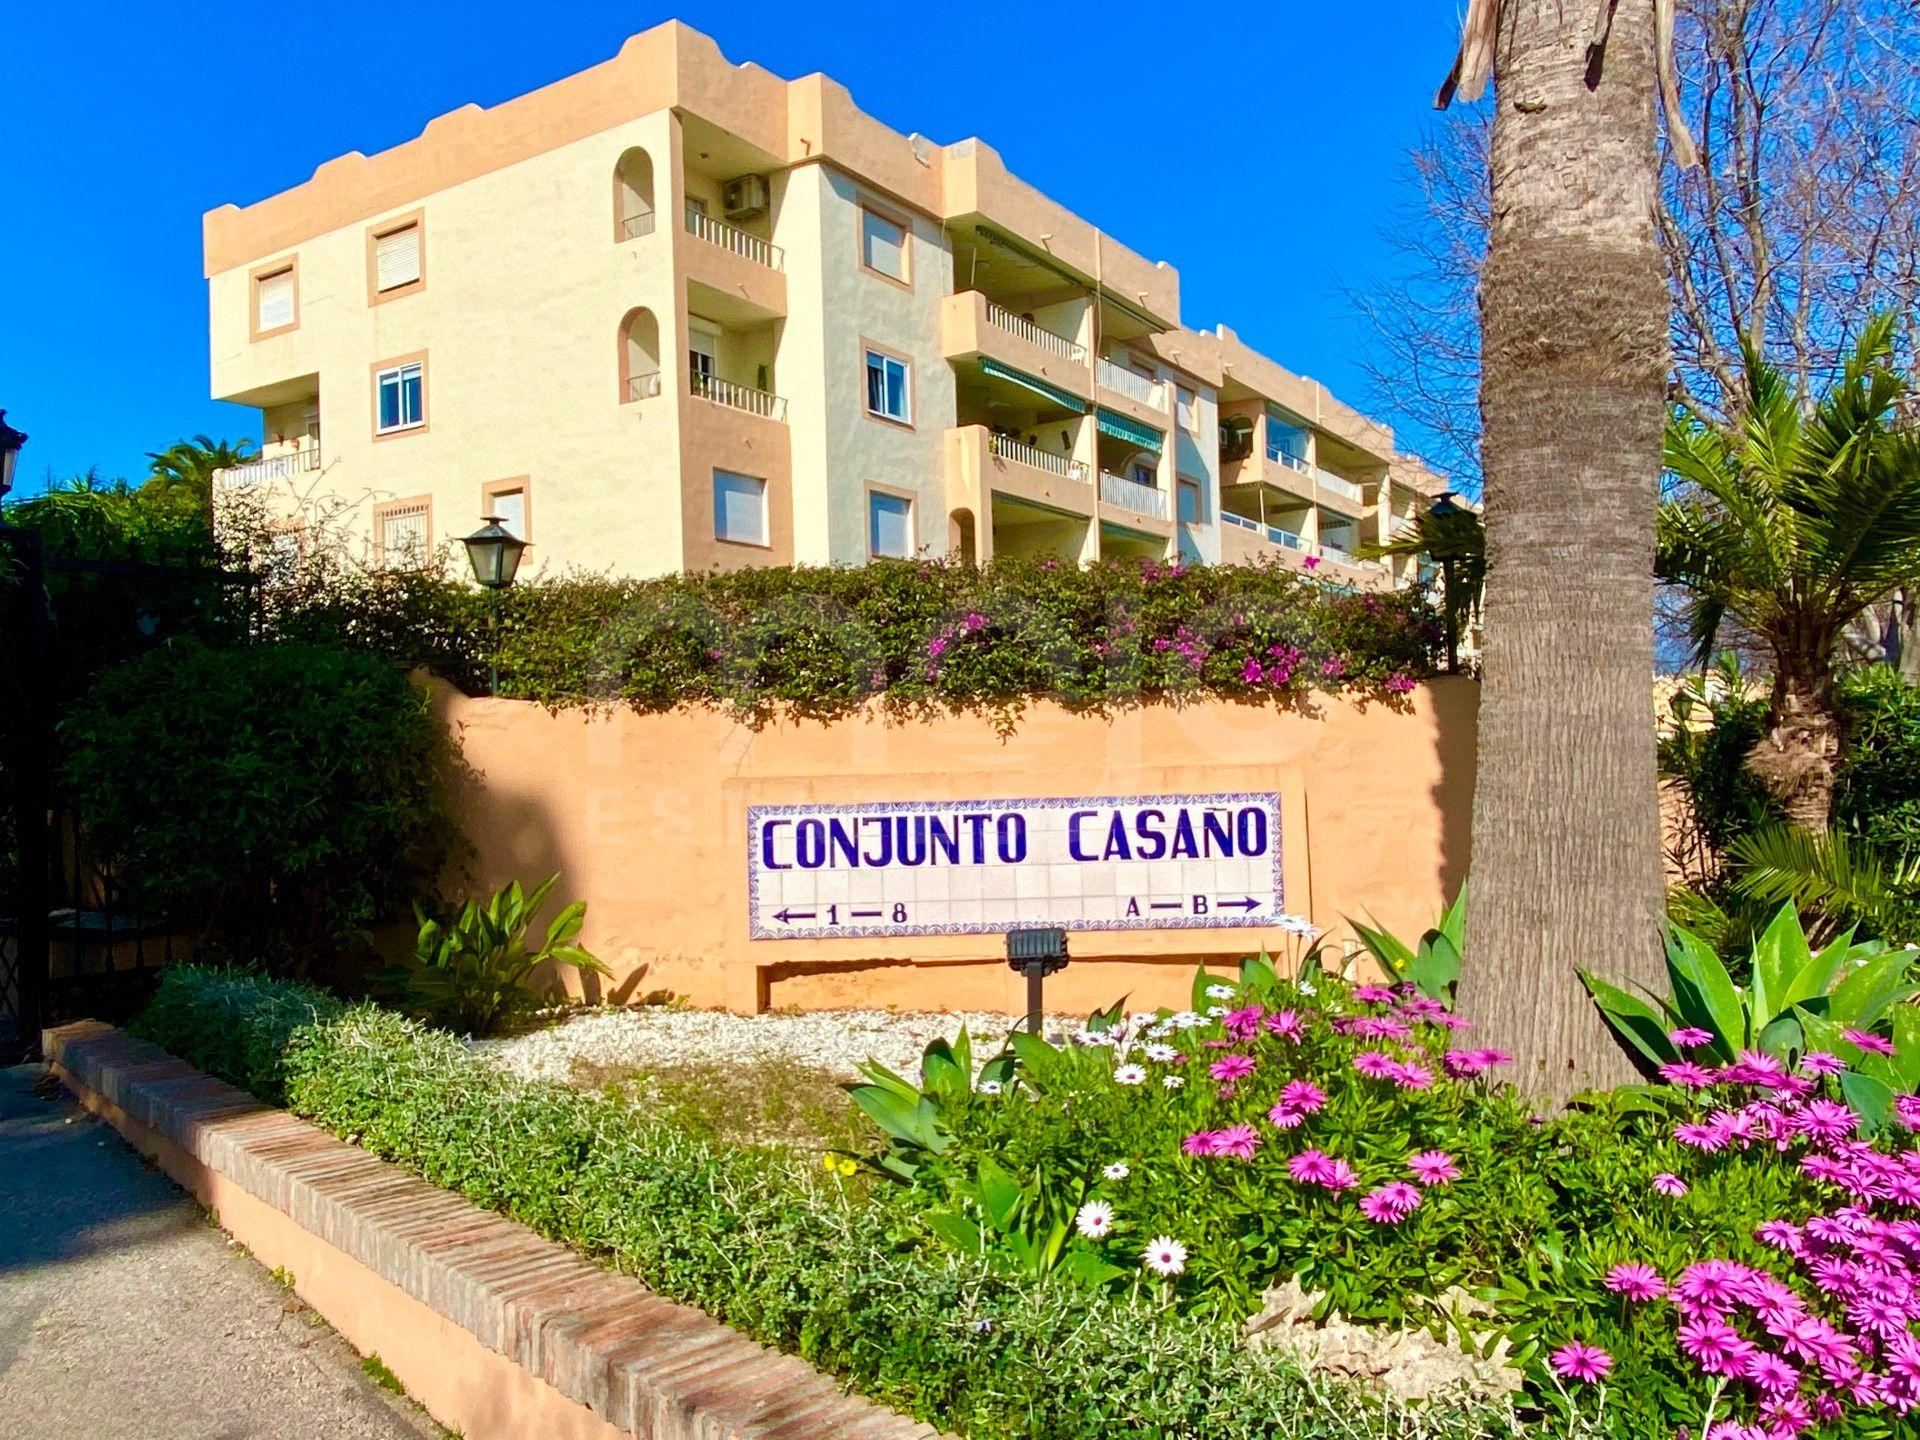 Appartement te koop in Conjunto Casaño, Nueva Andalucia